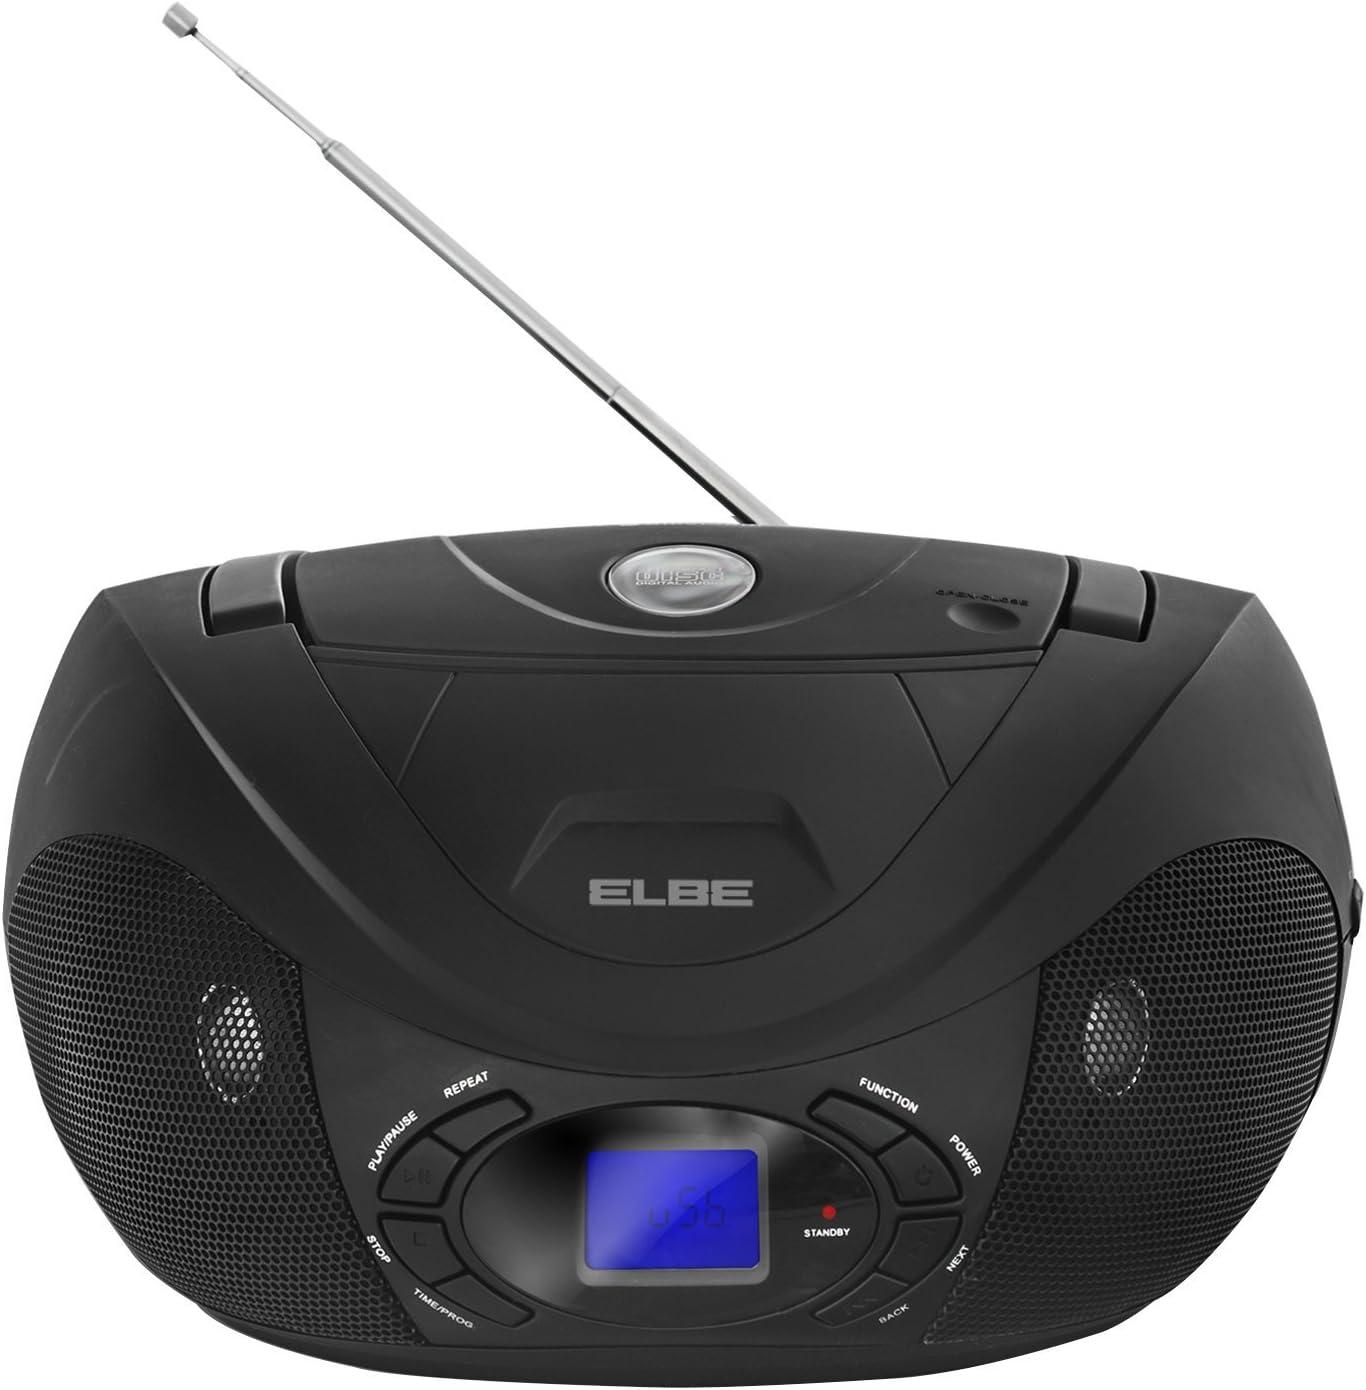 Elbe GPM-237-USB - Radio CD, 2 x 1.5 W, Pantalla LCD, MP3, Lector ...